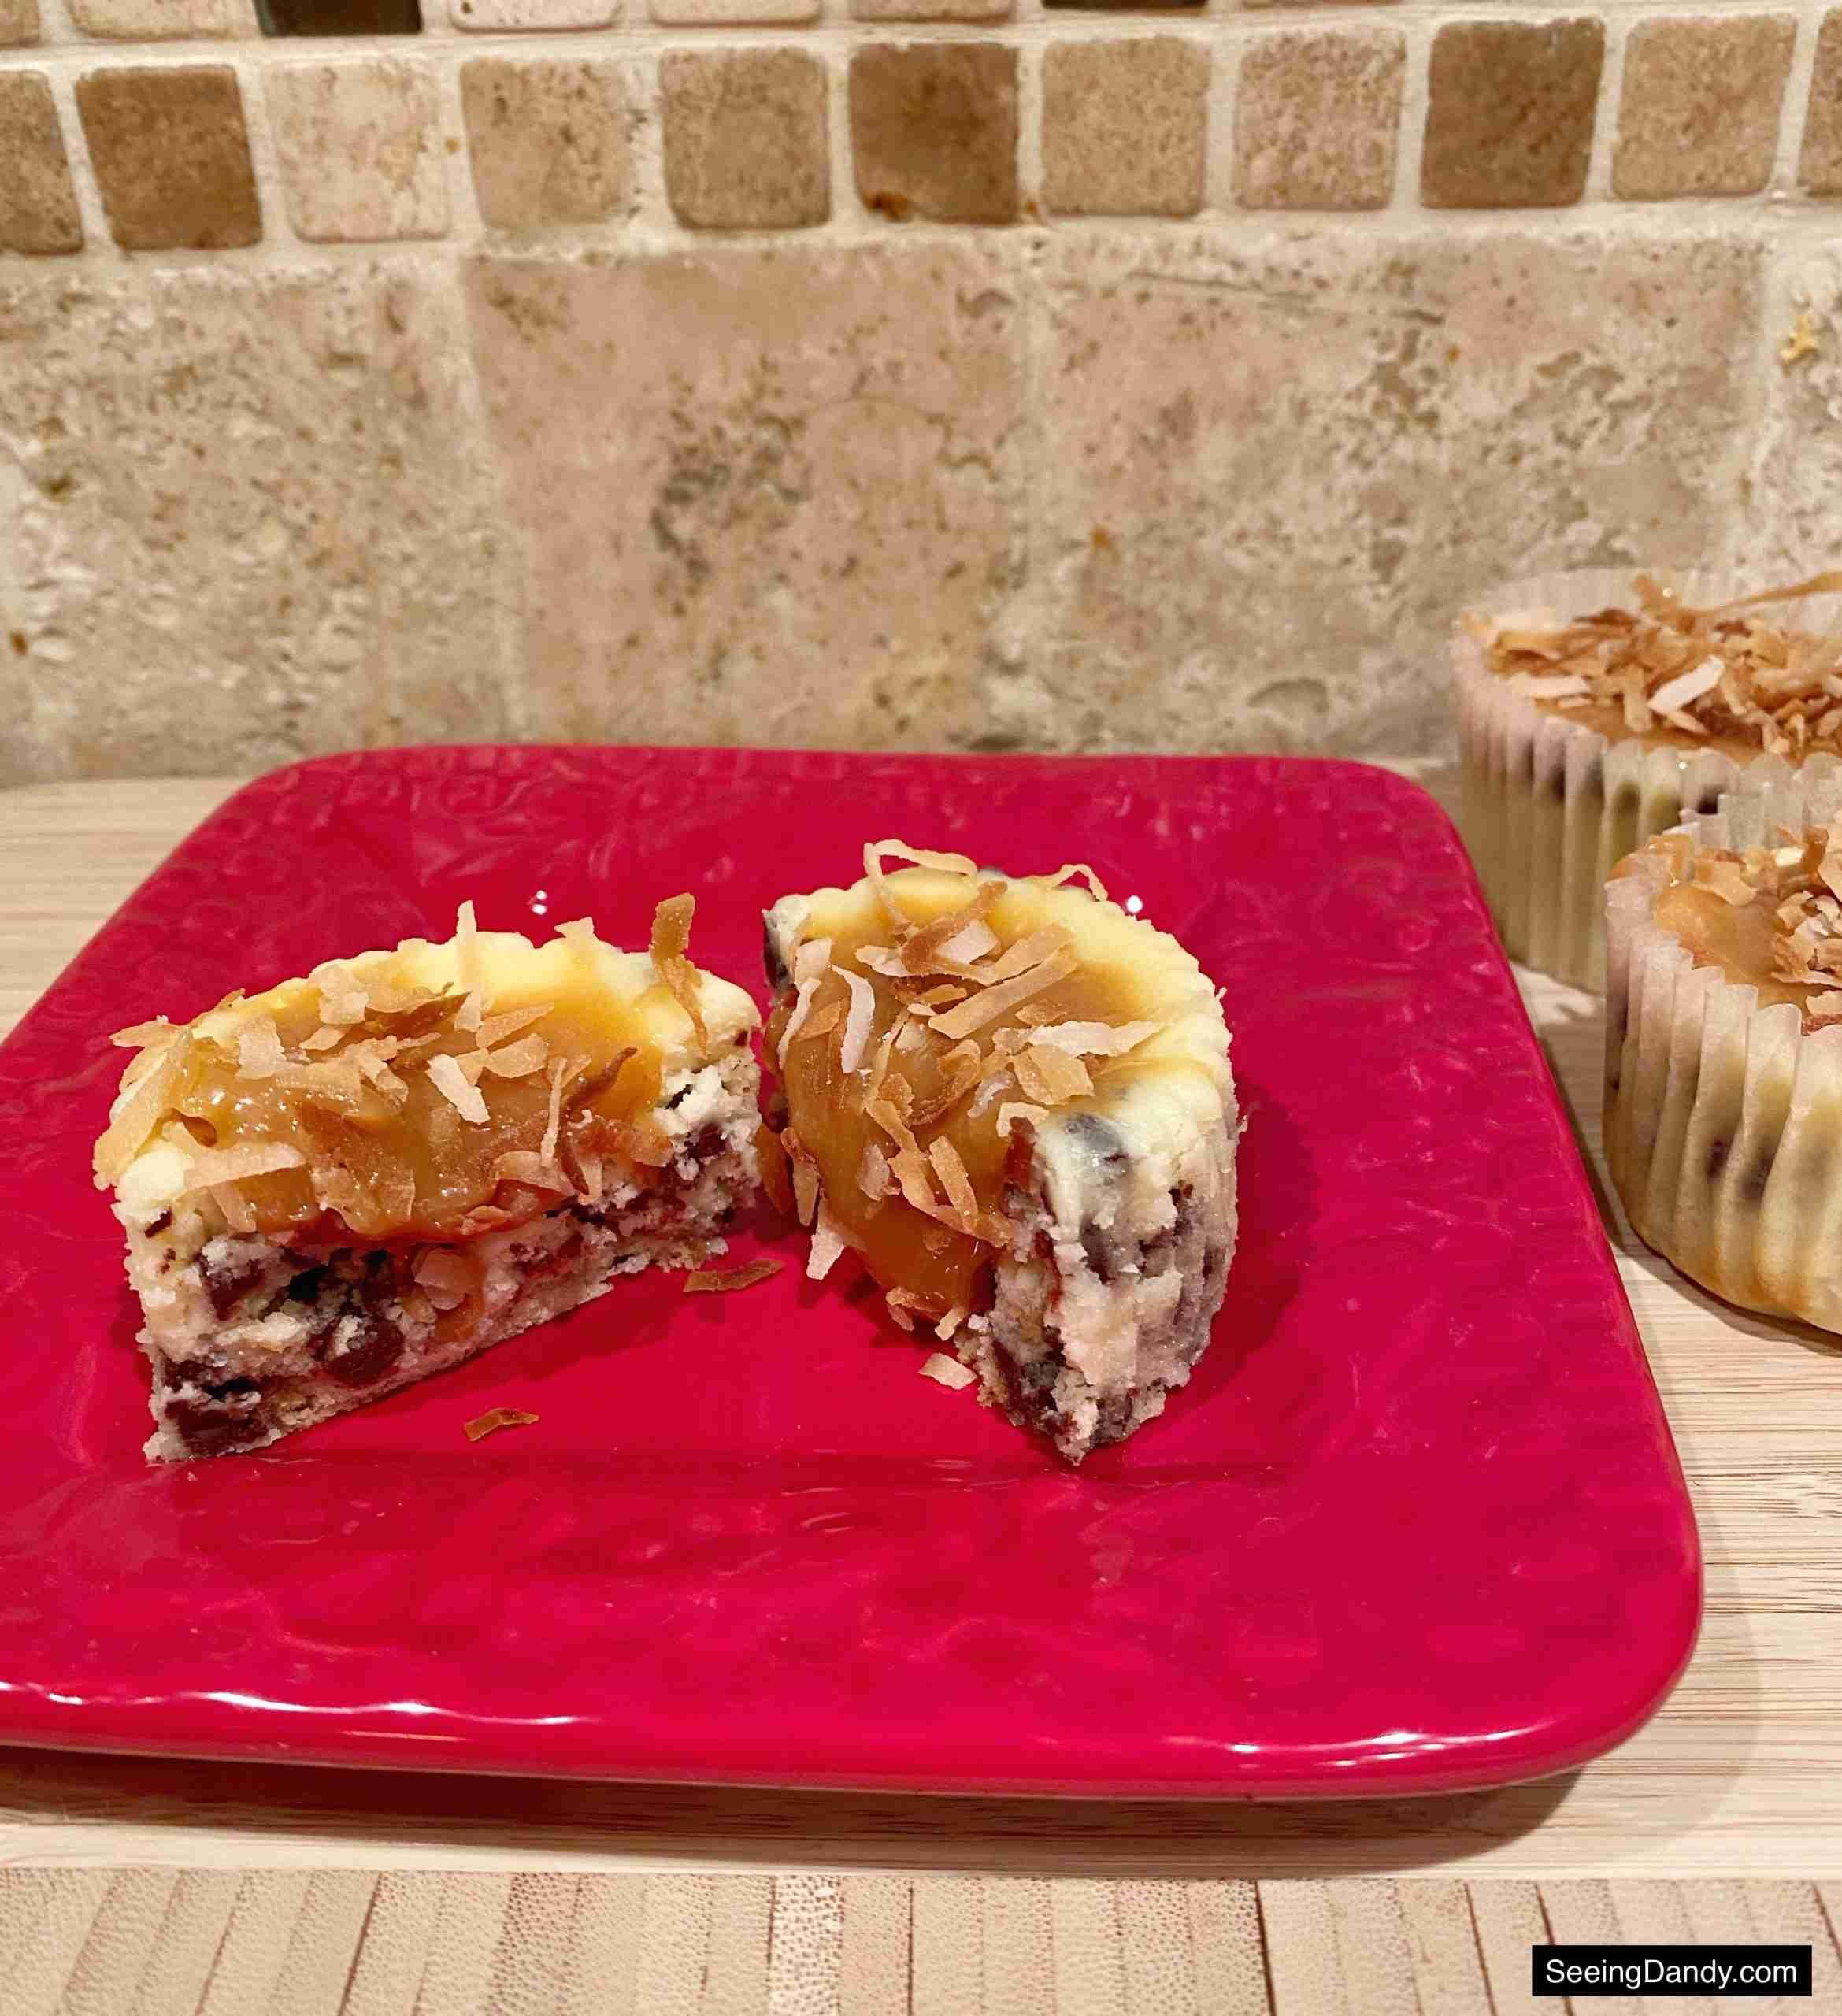 samoa cheesecake cupcakes, girl scout cookies copycat, dessert recipes, chocolate chip cheesecake